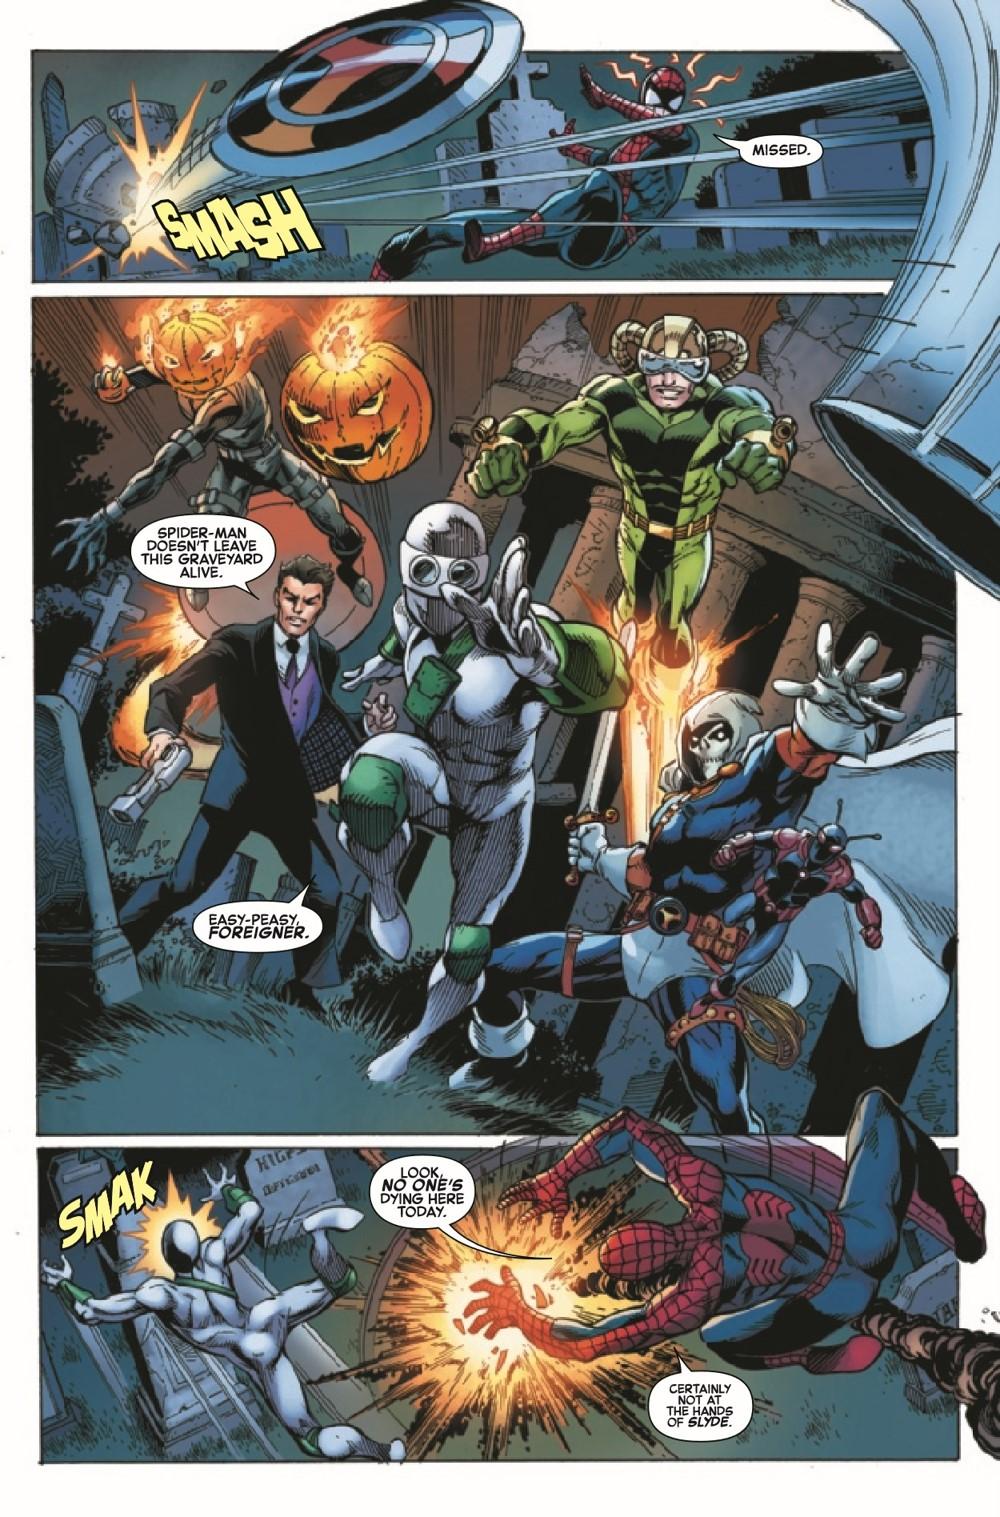 SINISTERWAR2021002_Preview-5 ComicList Previews: SINISTER WAR #2 (OF 4)